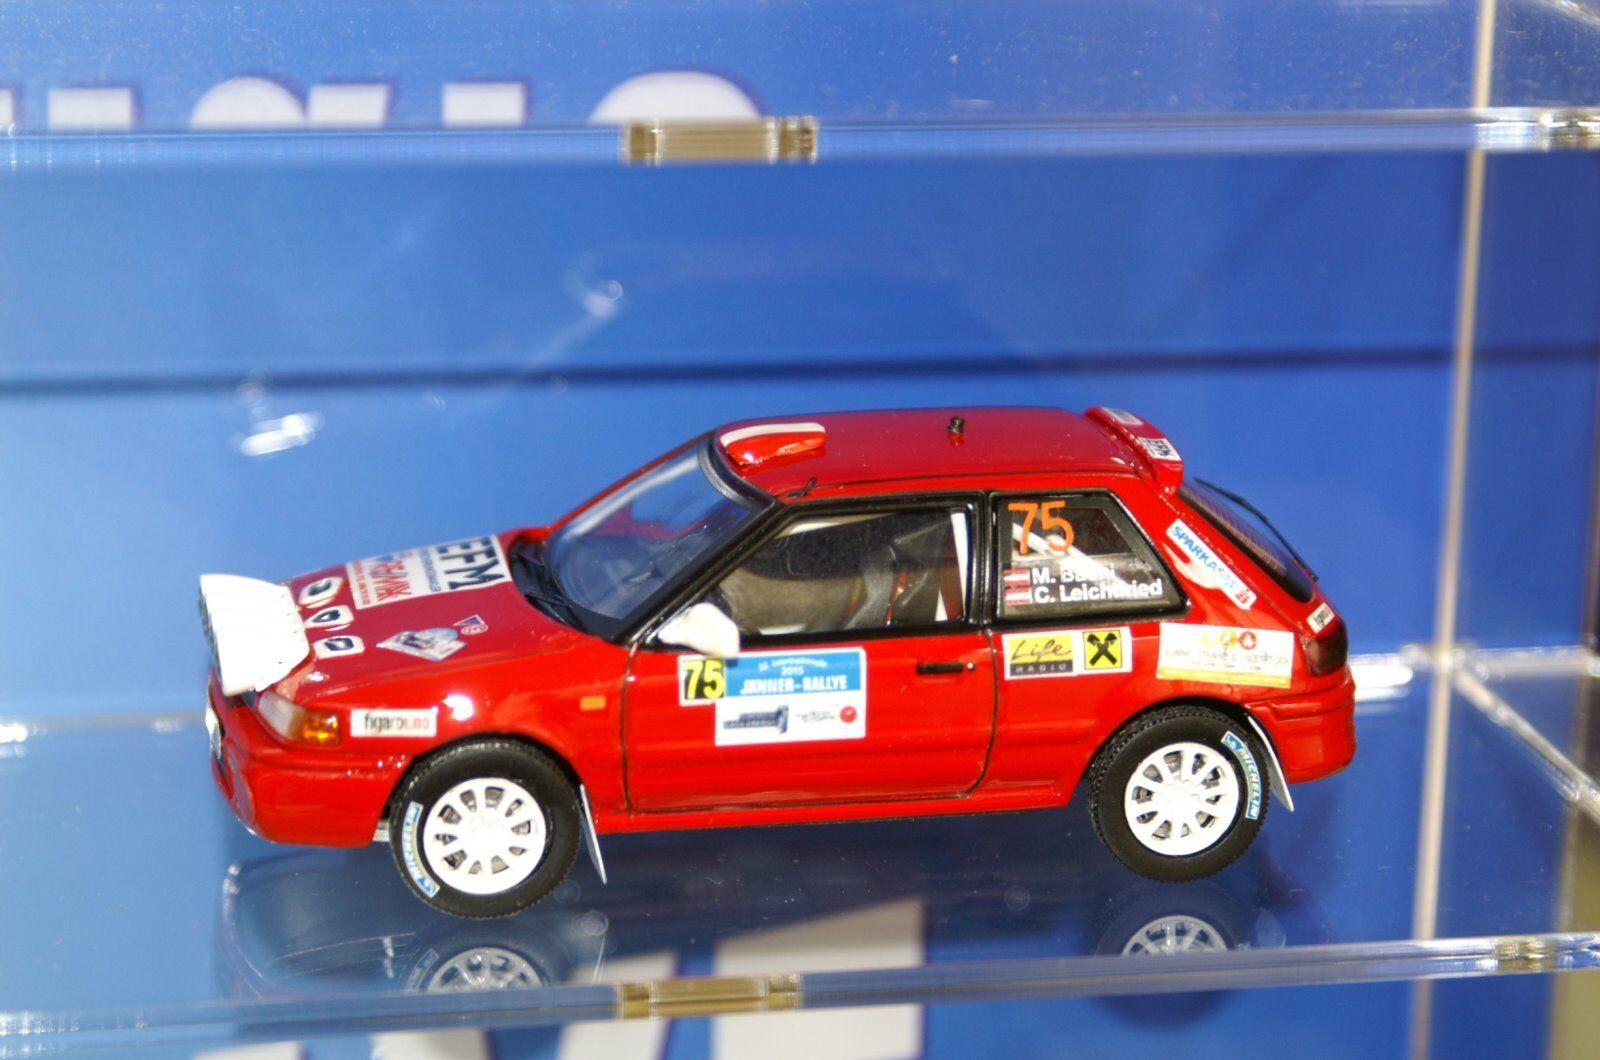 1 43 Mazda 323 BG 4WD  Jänner-Rallye  2015 , Bachl Leichtfried  offres de vente